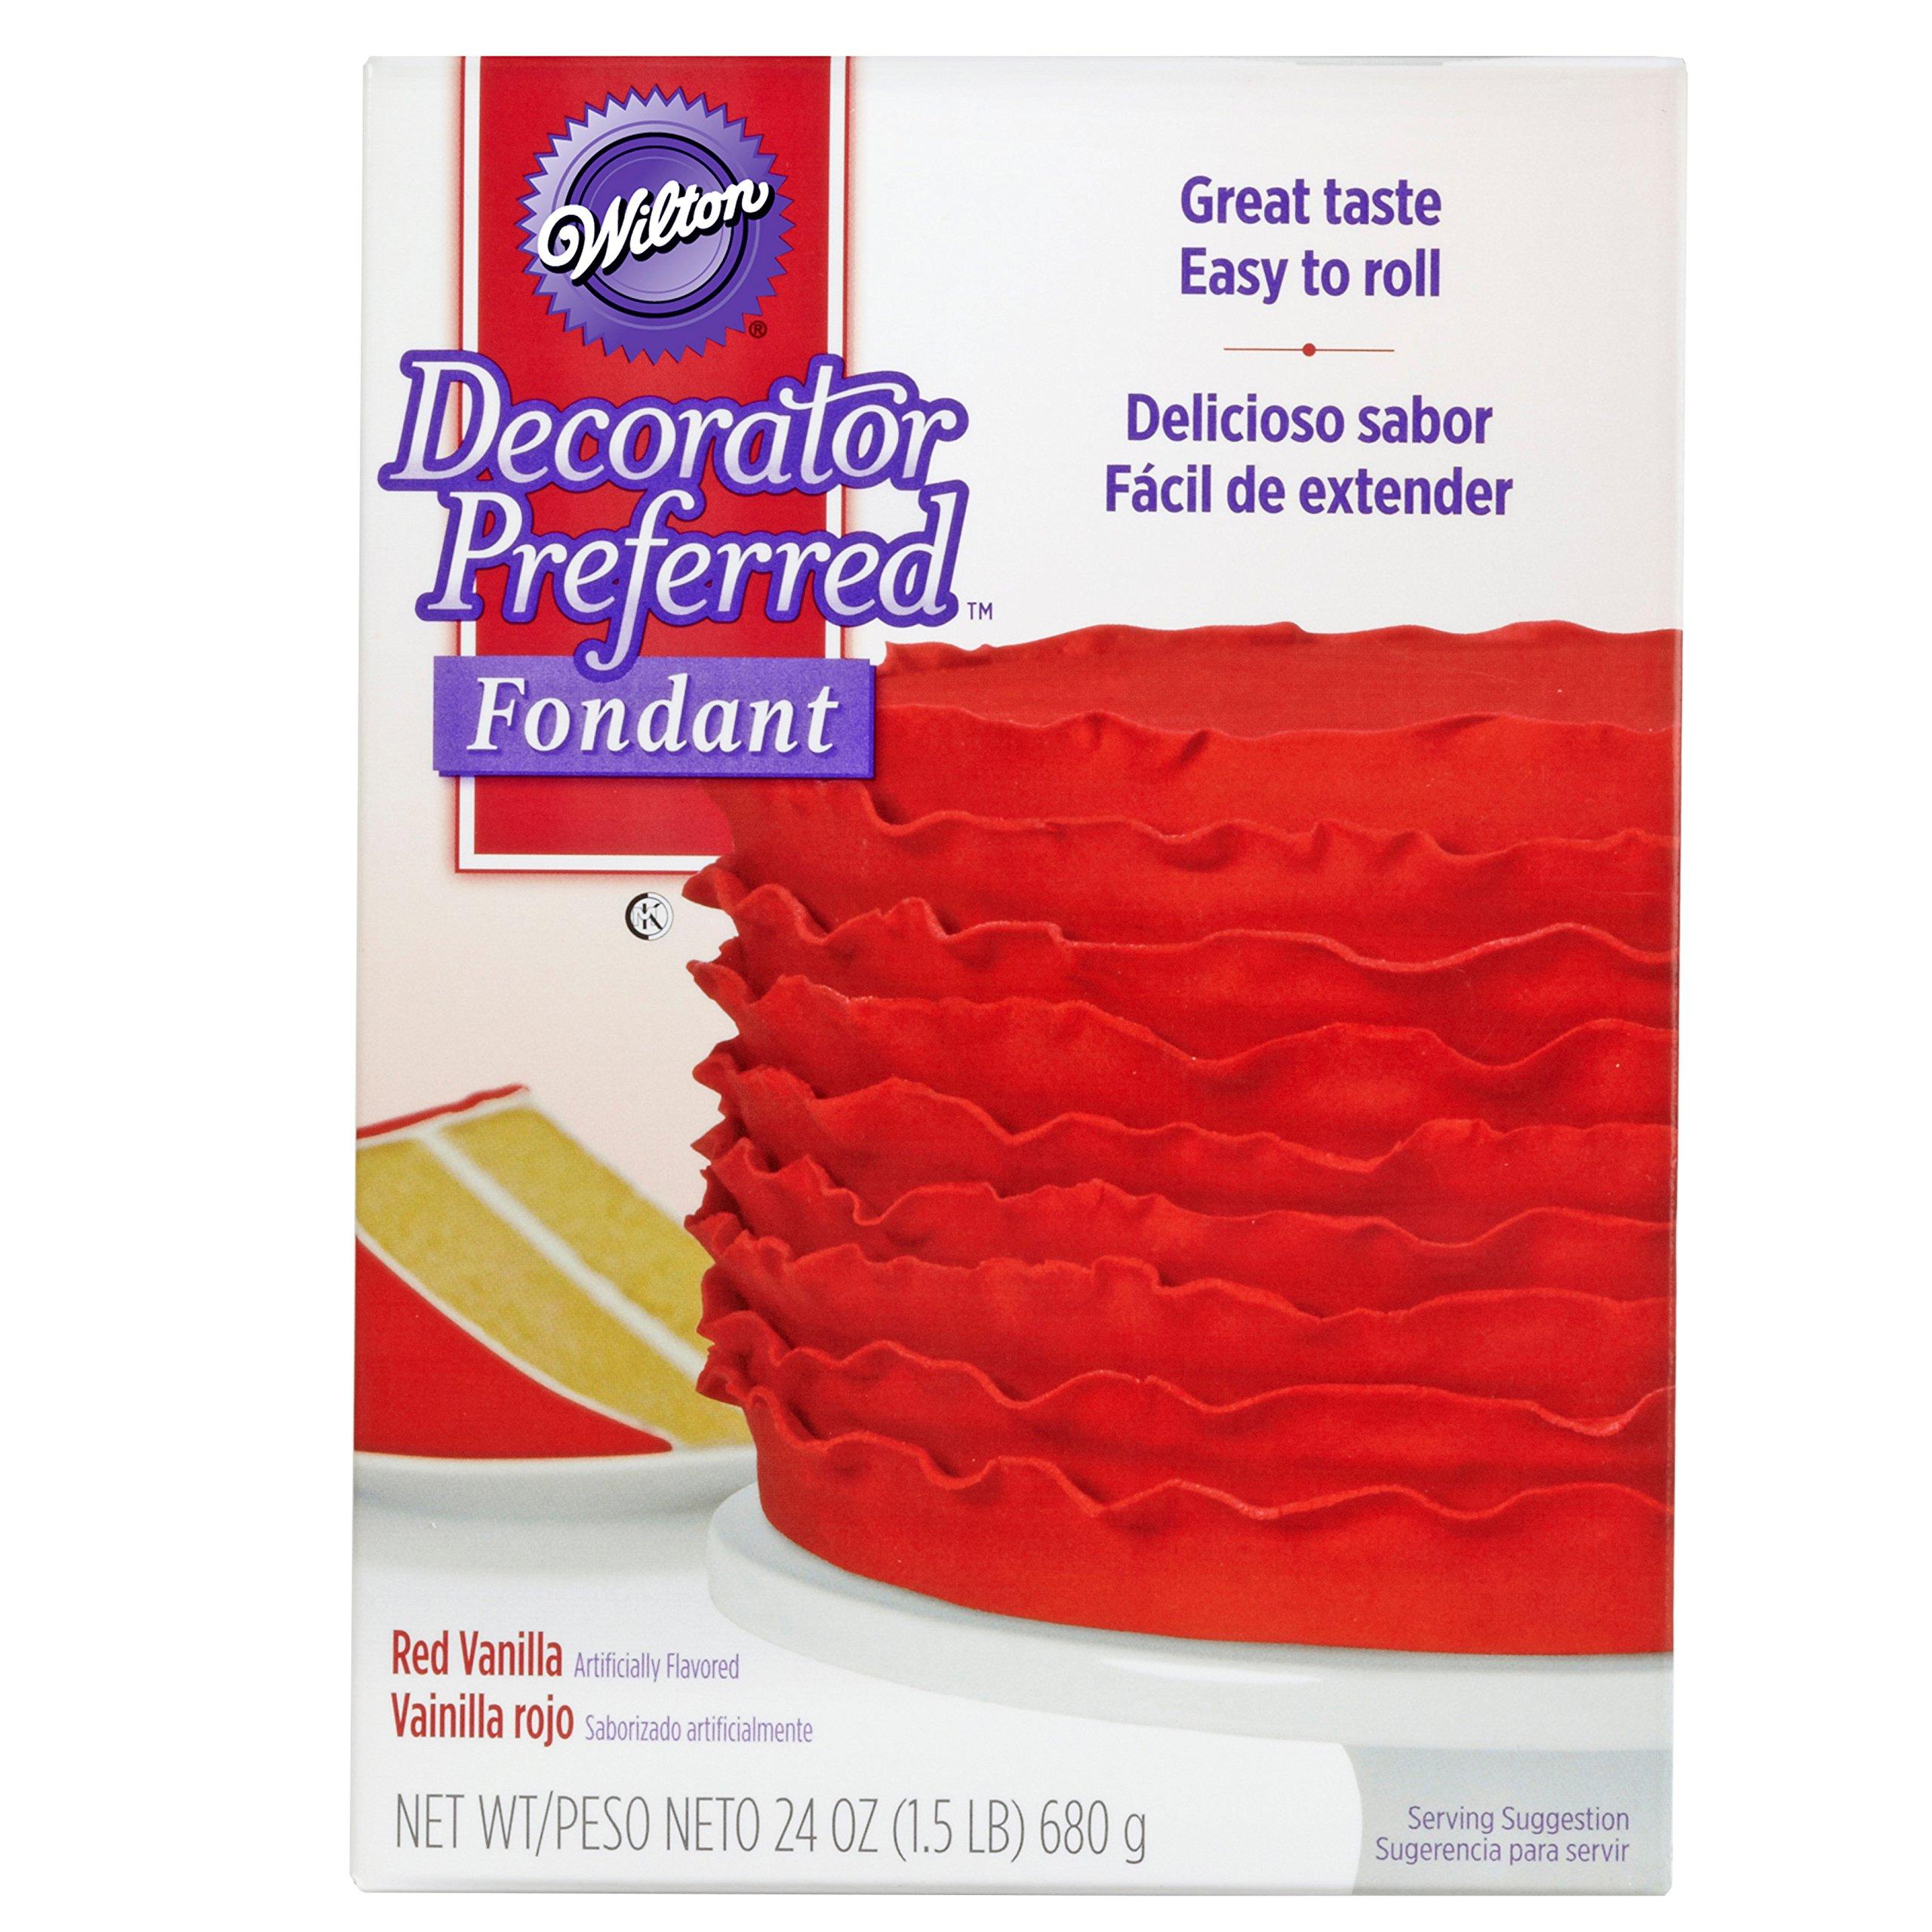 Wilton Decorator Preferred Red Fondant, 24 oz. Fondant Icing by Wilton